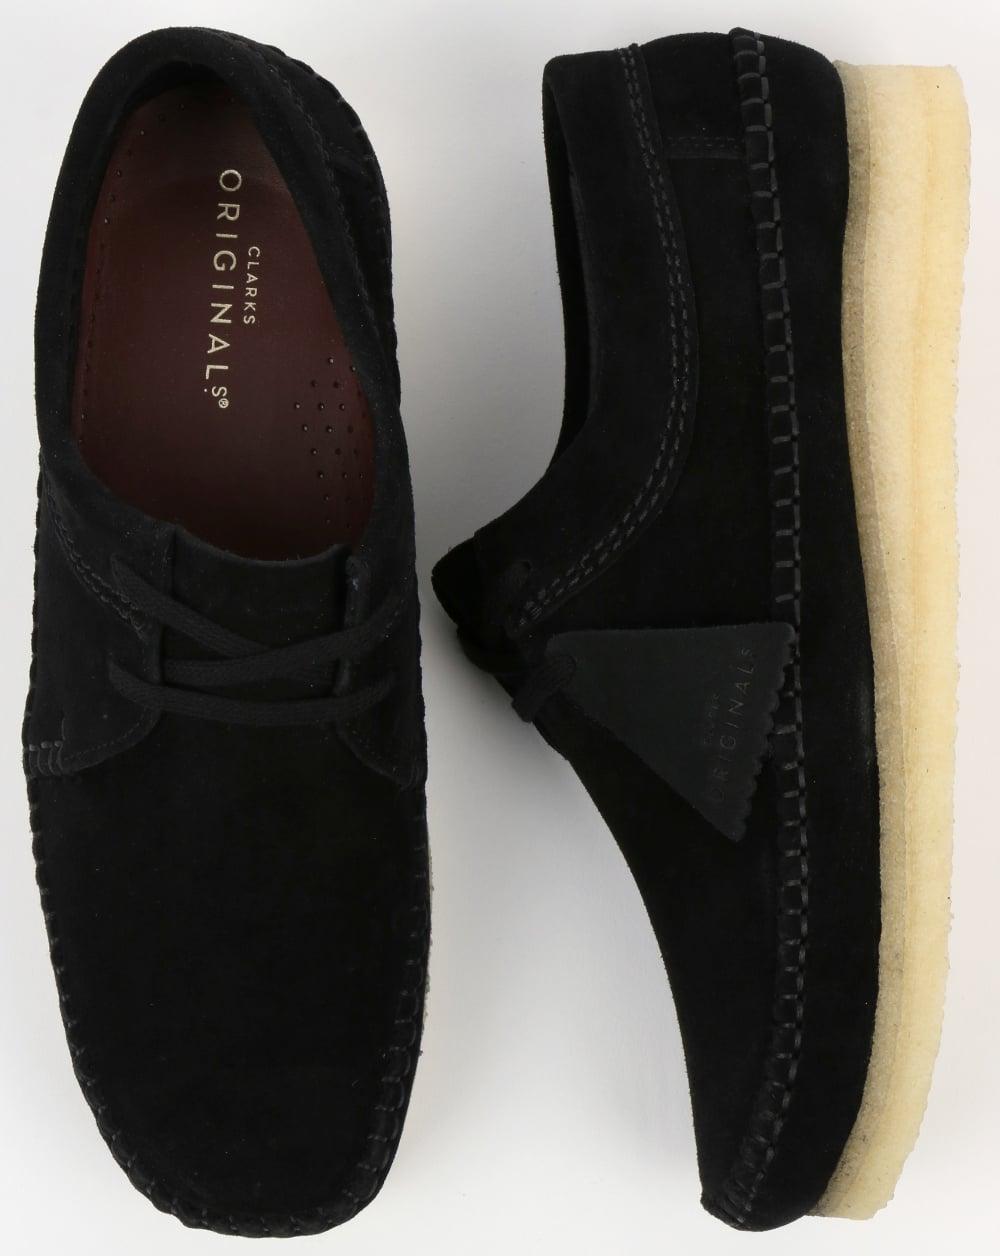 Clarks Originals Weaver Suede Shoes